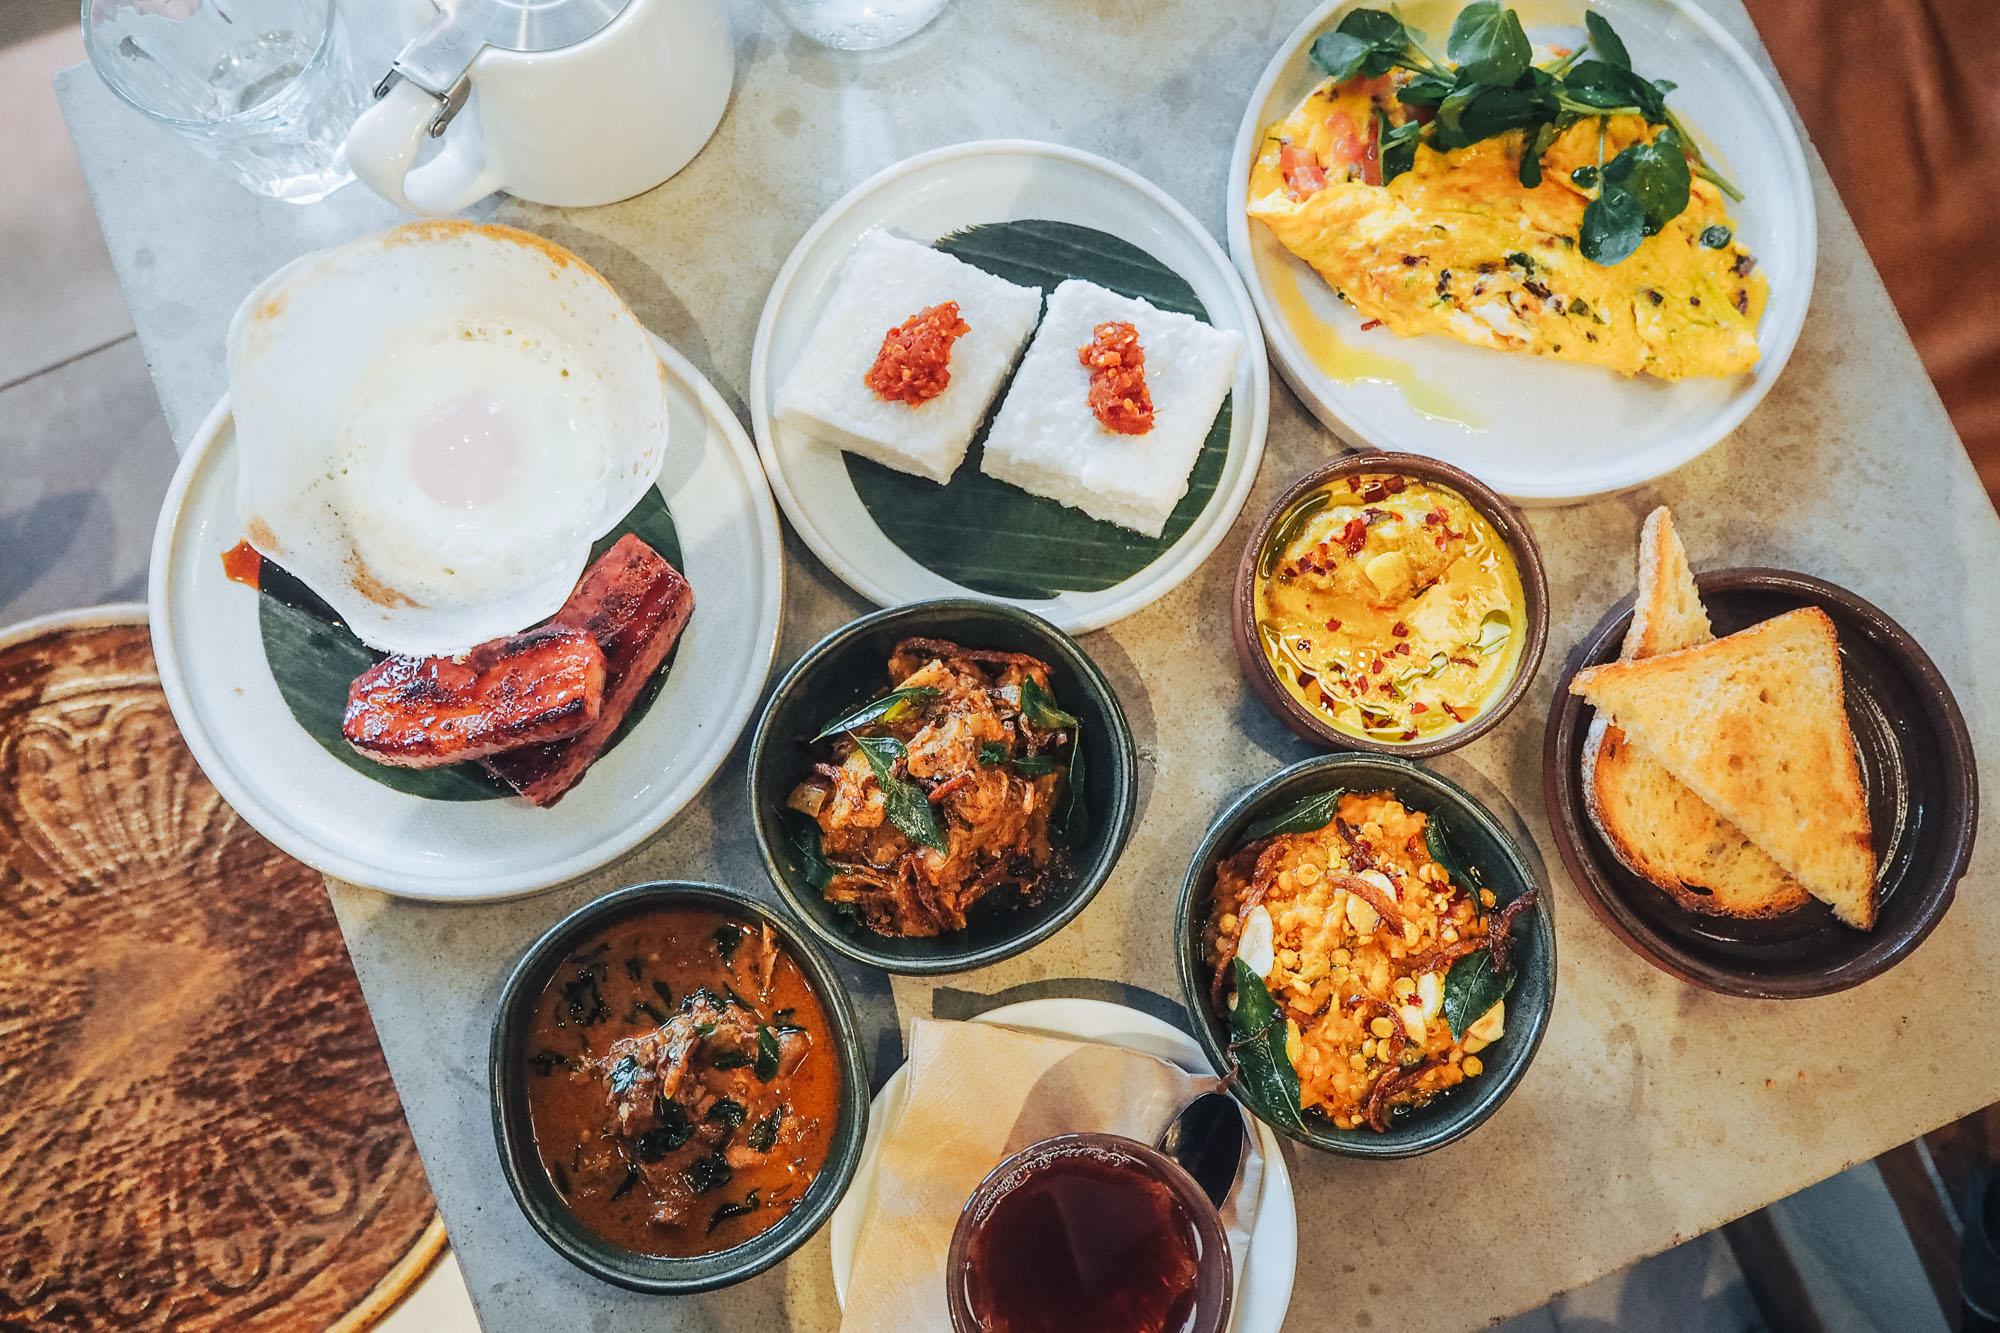 Sri Lankan brunch menu at Kolamba restaurant in Soho, London